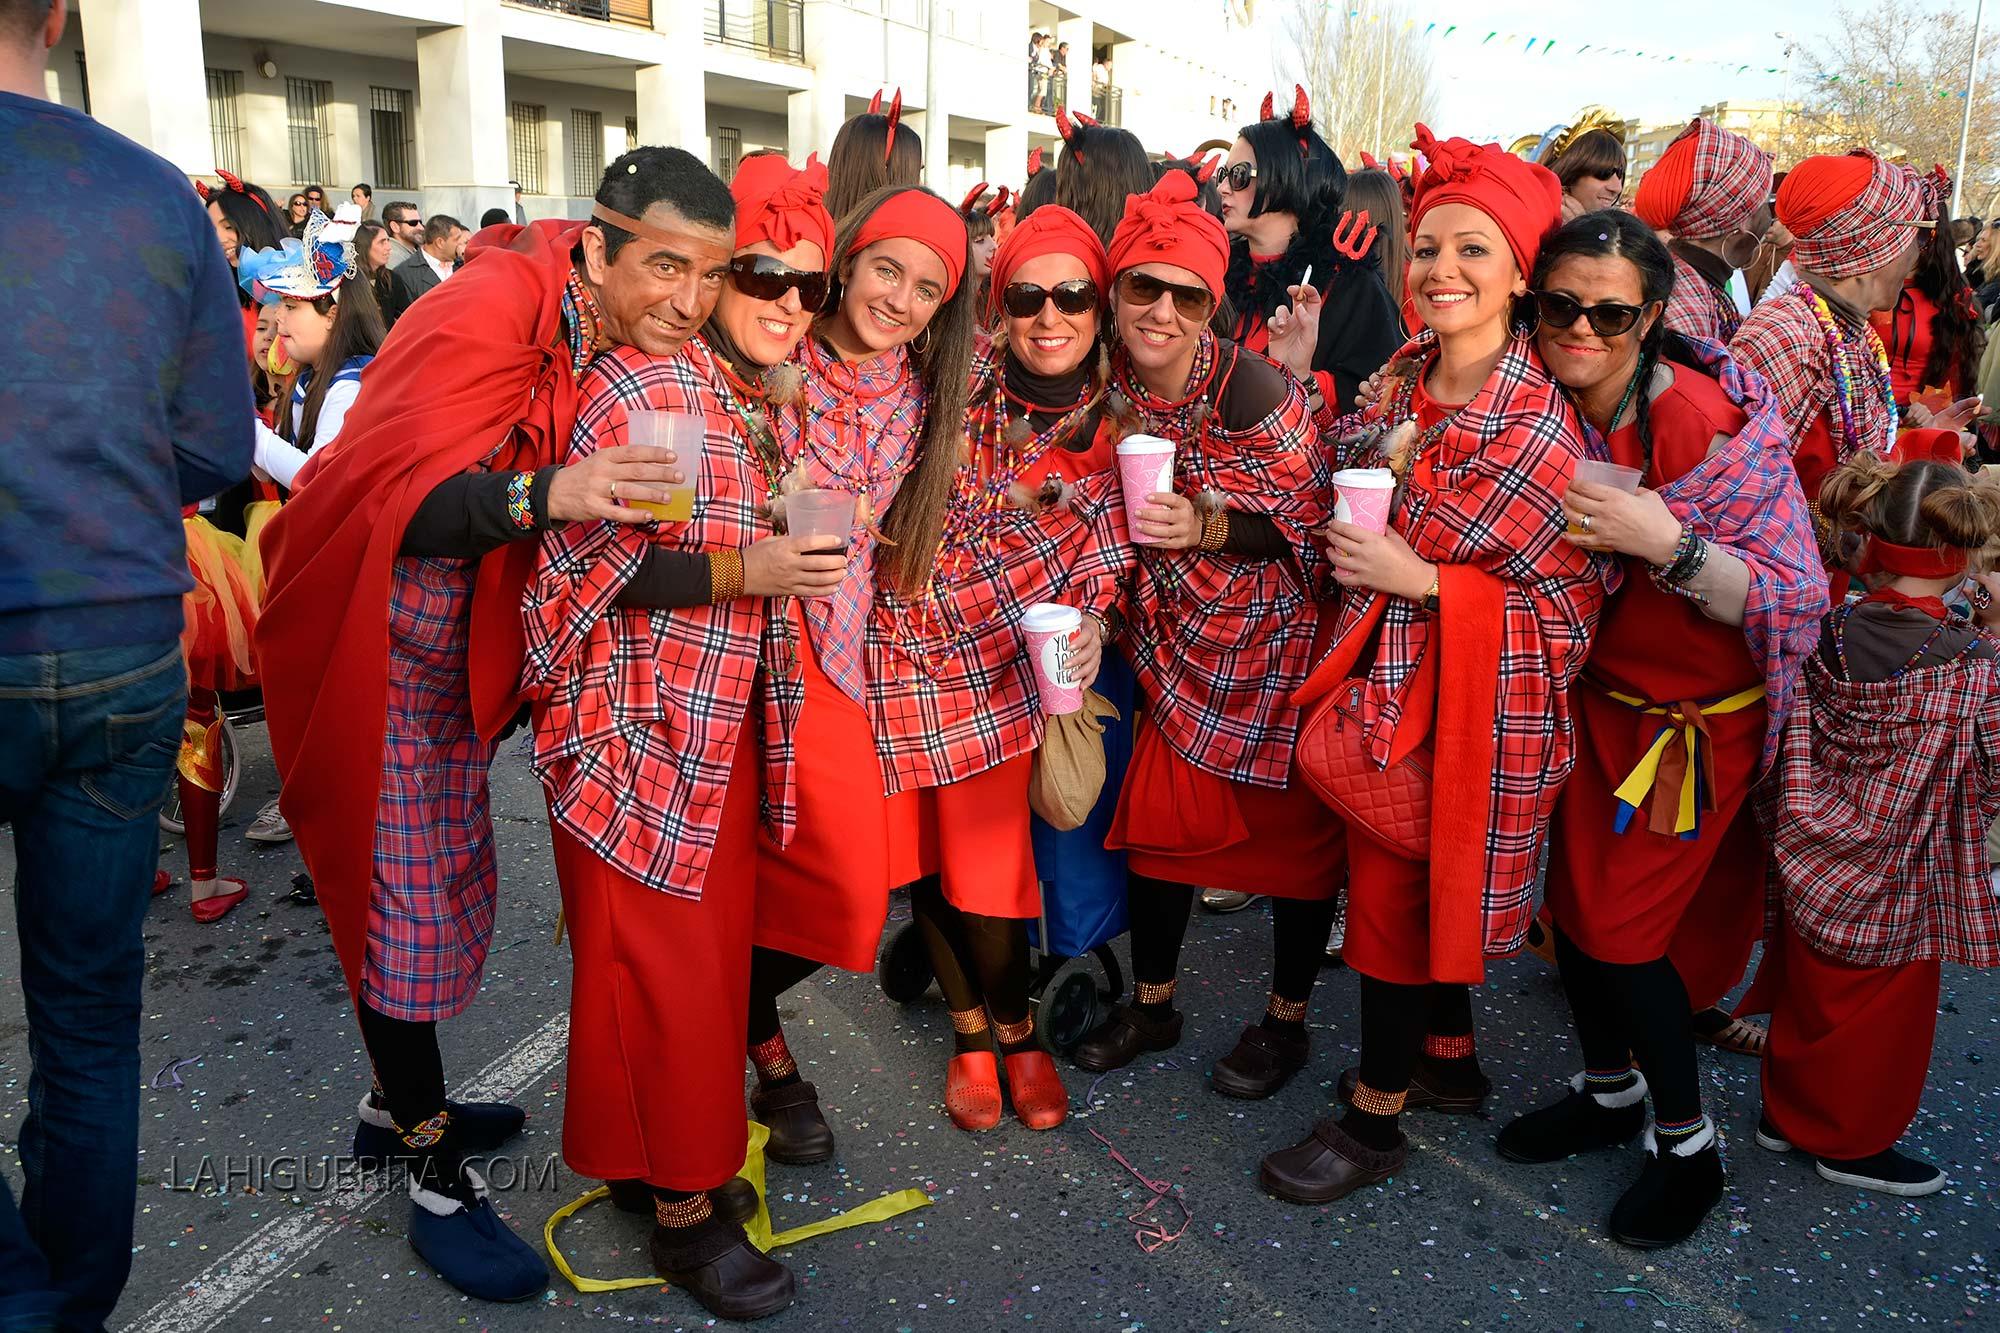 cabalgata carnaval isla cristina _DSC0786